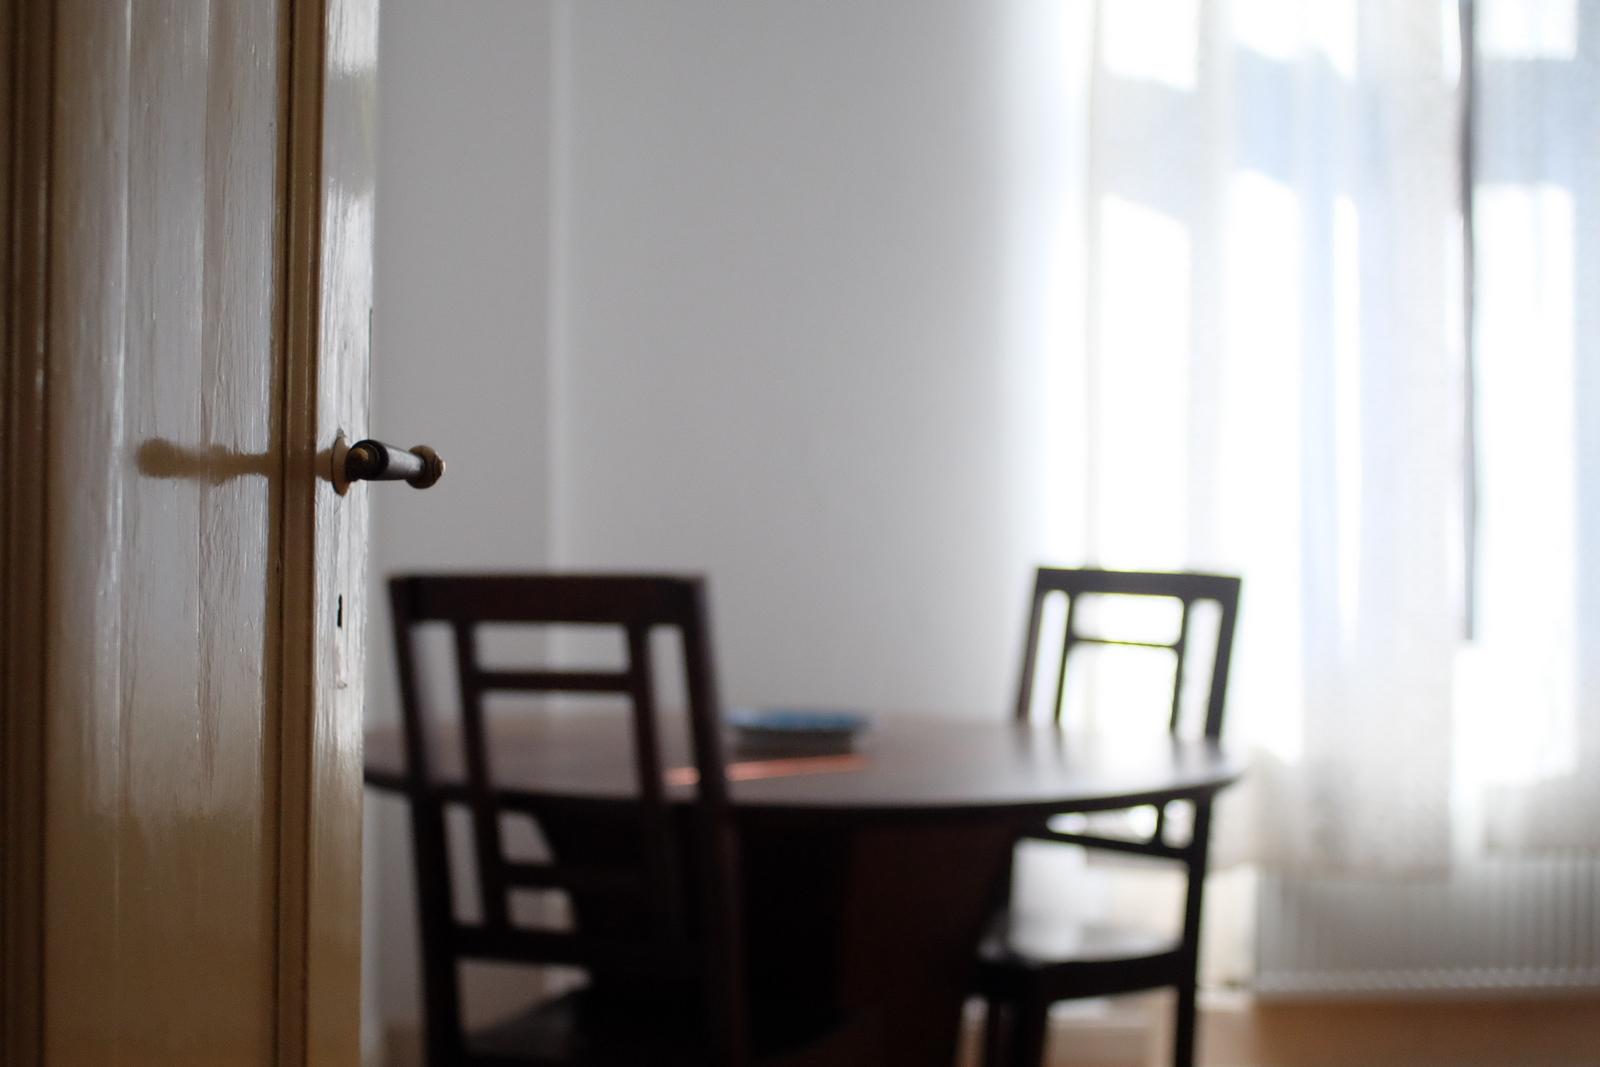 dscf8455 Furnished apartment with Balcony in Frankfurt Bockenheim %Bockenheim